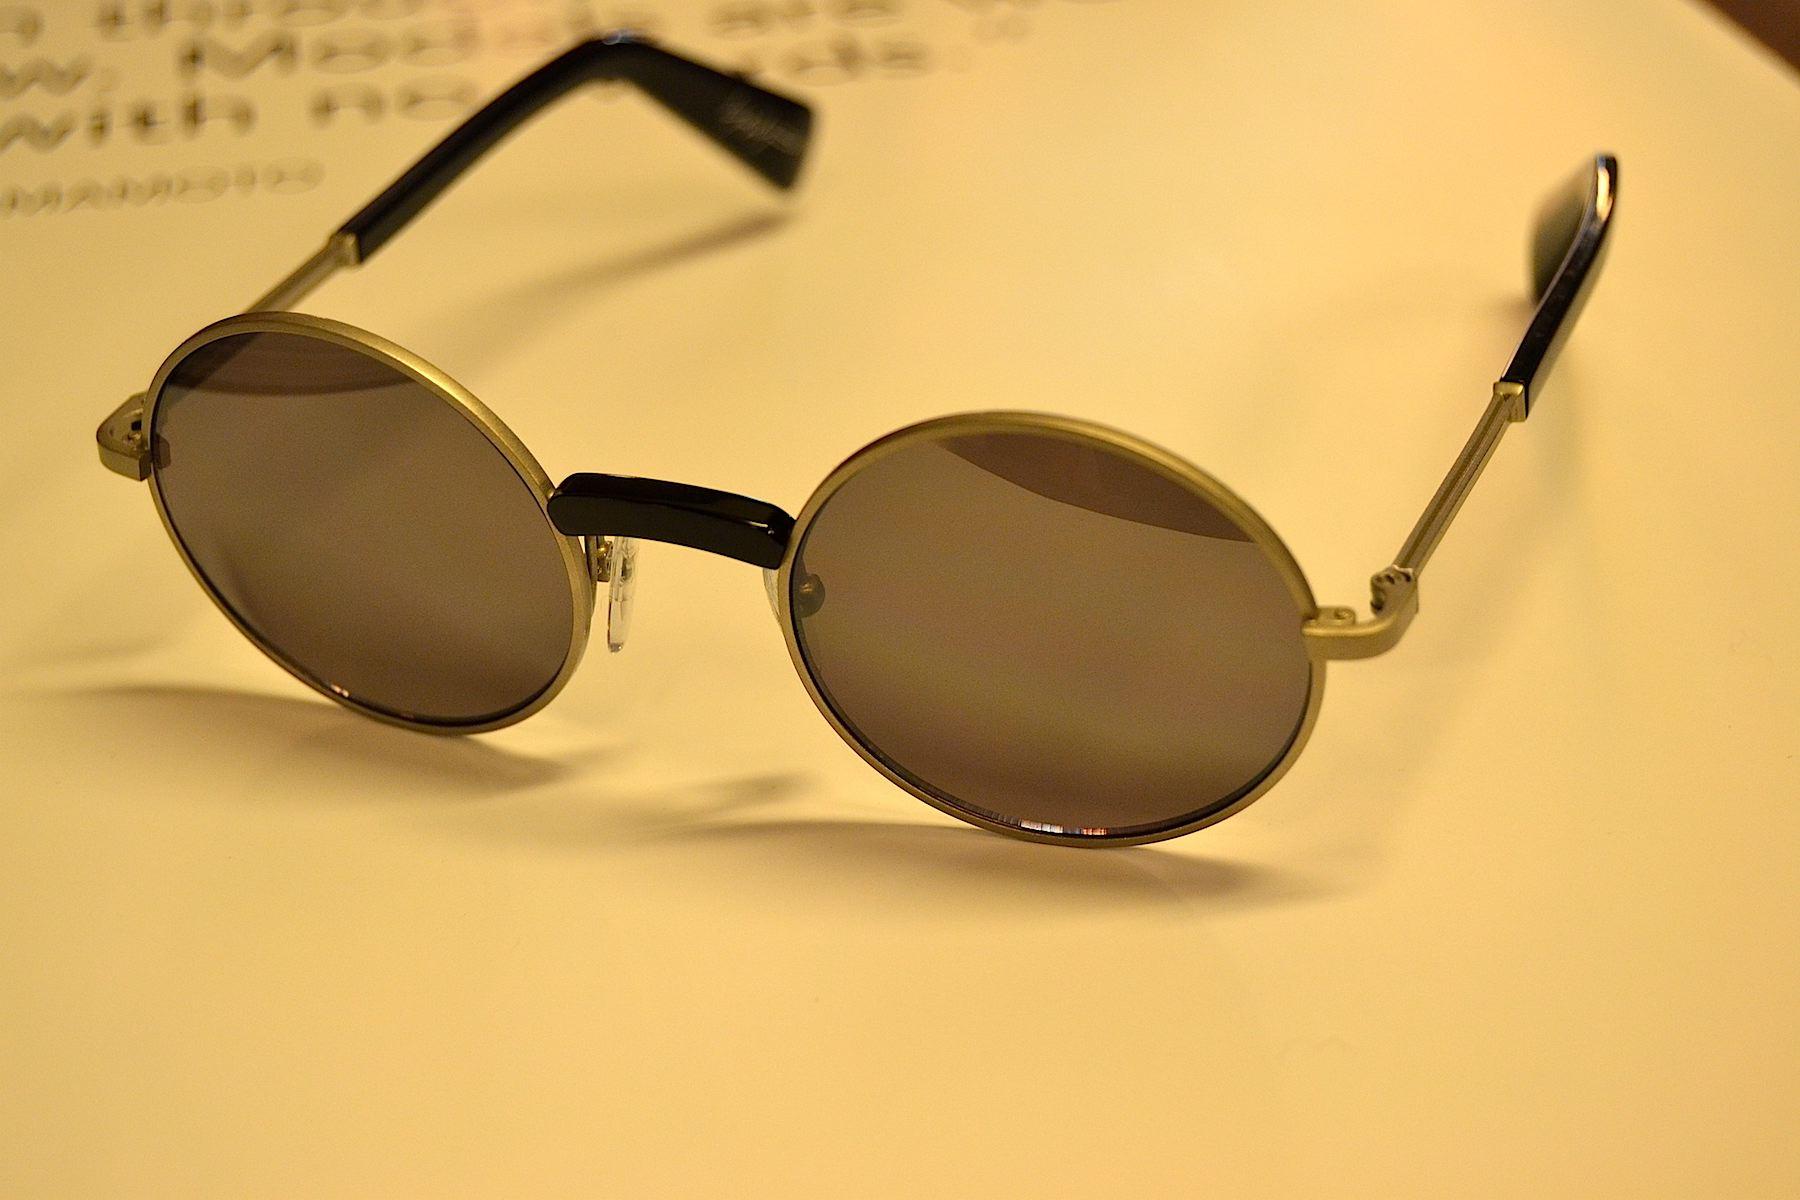 lenastore-bergamo-lenafashion-shop-online-yohji-yamamoto-gli-occhiali-sunglasses-3